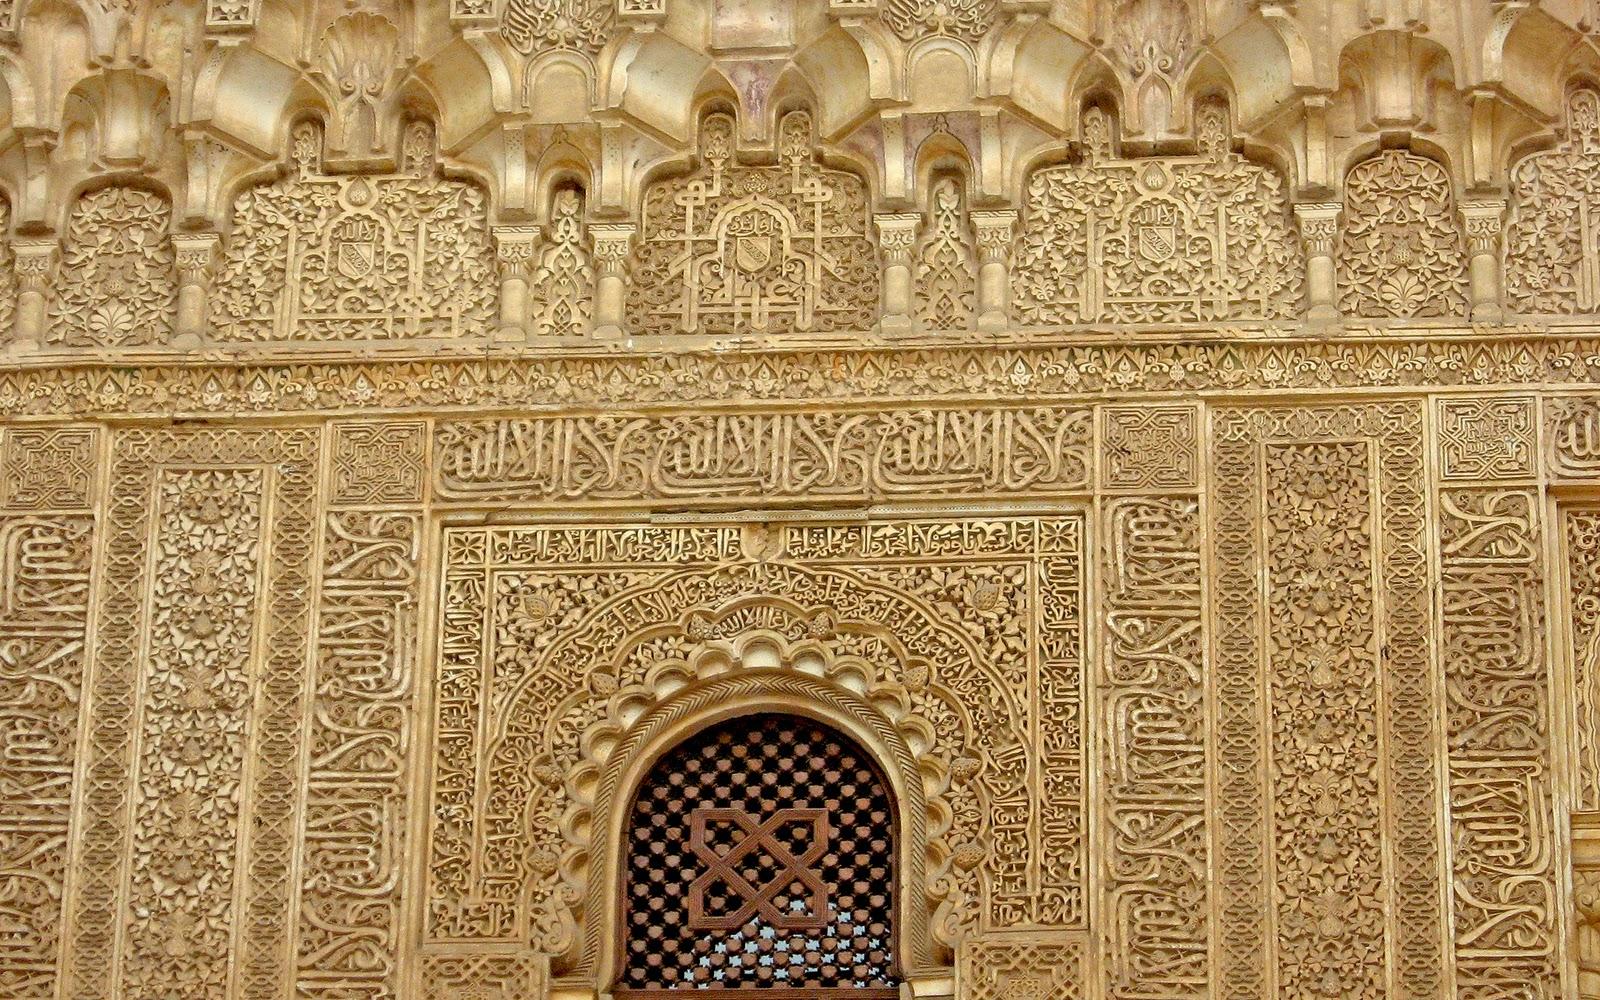 Traveler guide alhambra for Architecture arabe